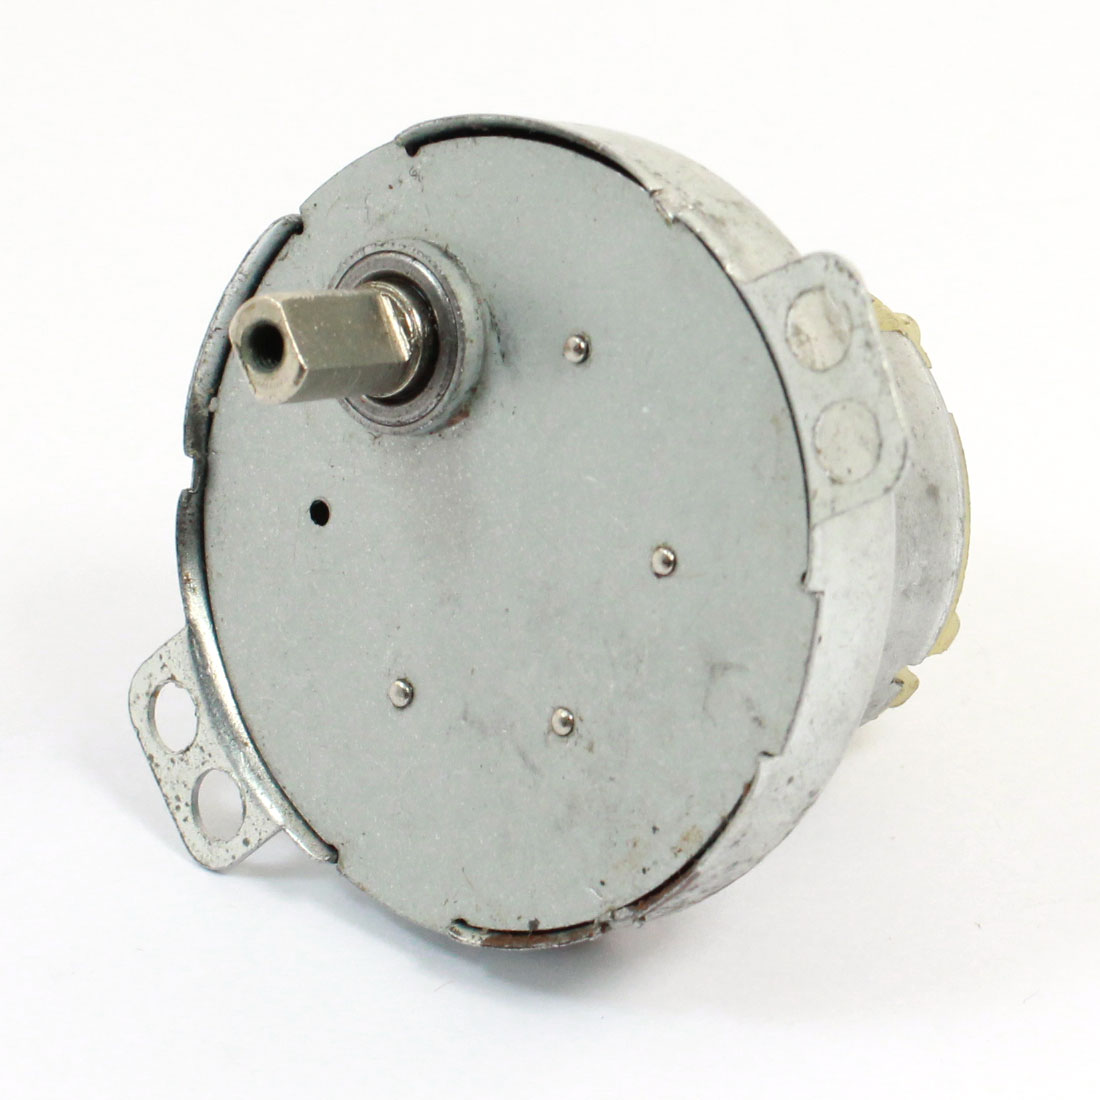 DC6-12V 12-14RPM 4mm Dia Drive Shaft Speed Reducing Gear Box Motor